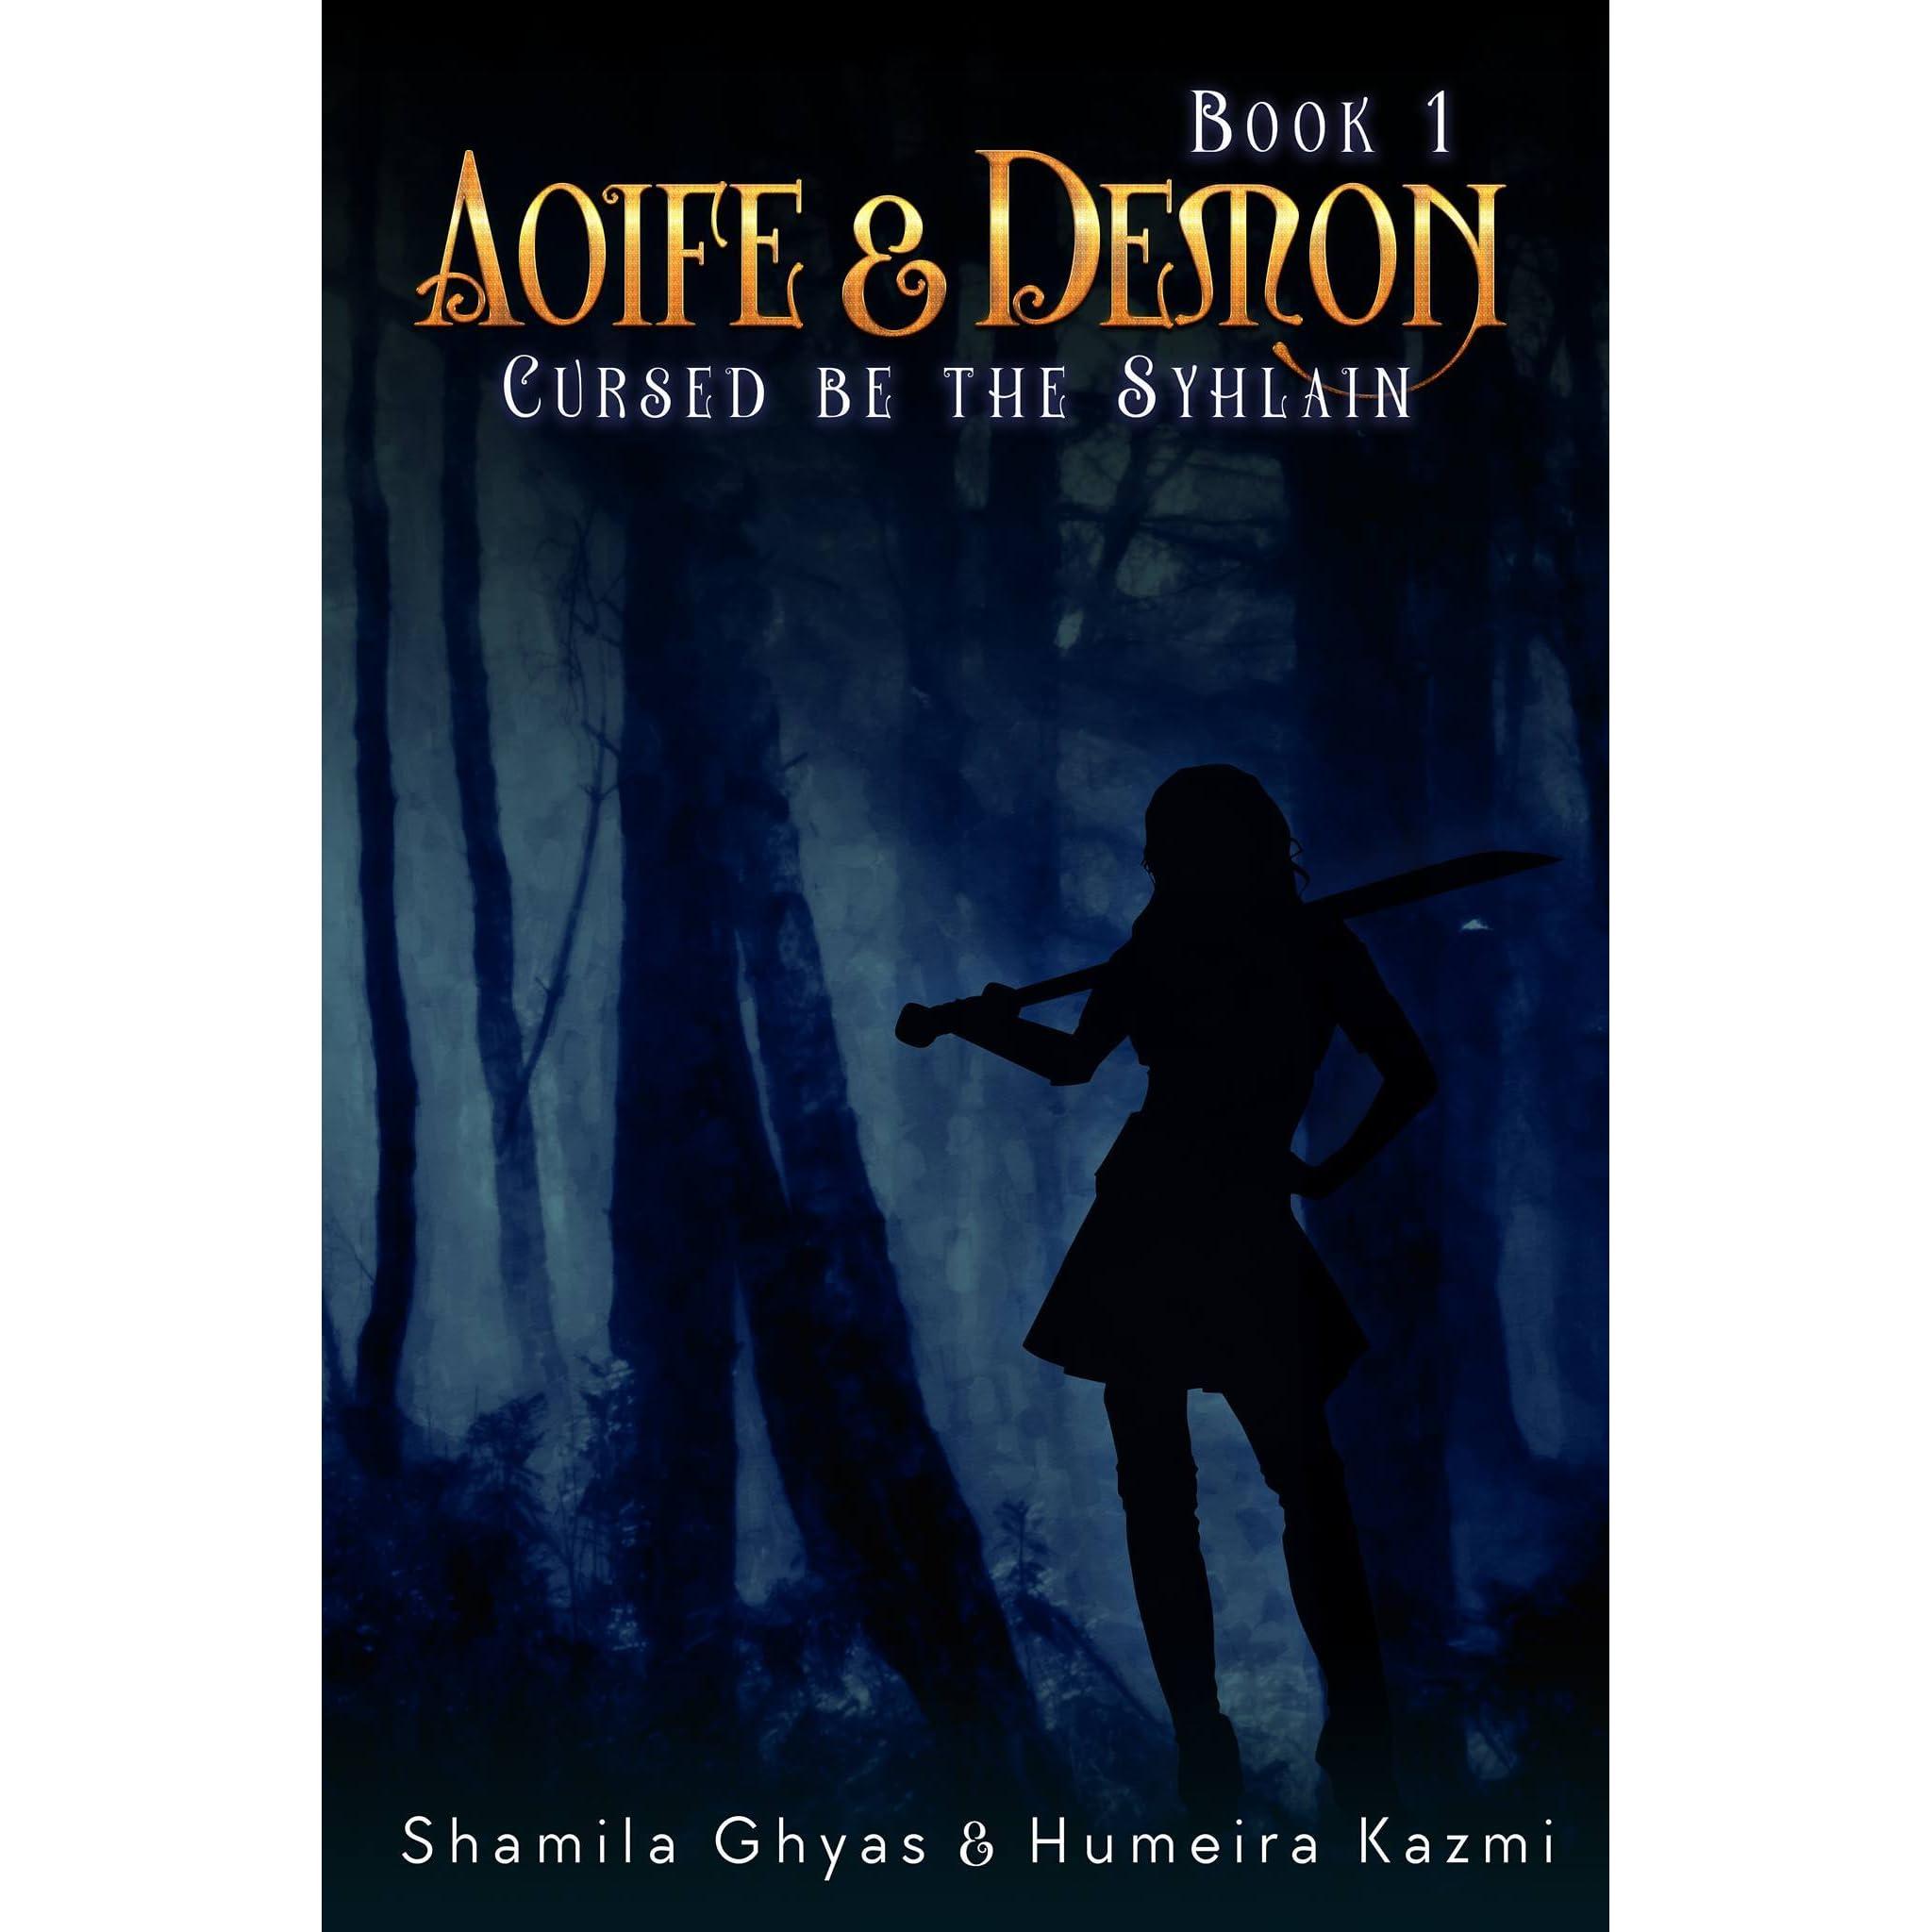 Aoife and Demon: Cursed Be the Syhlain - Humeira Kazmi, Shamila Ghyas - Google книги